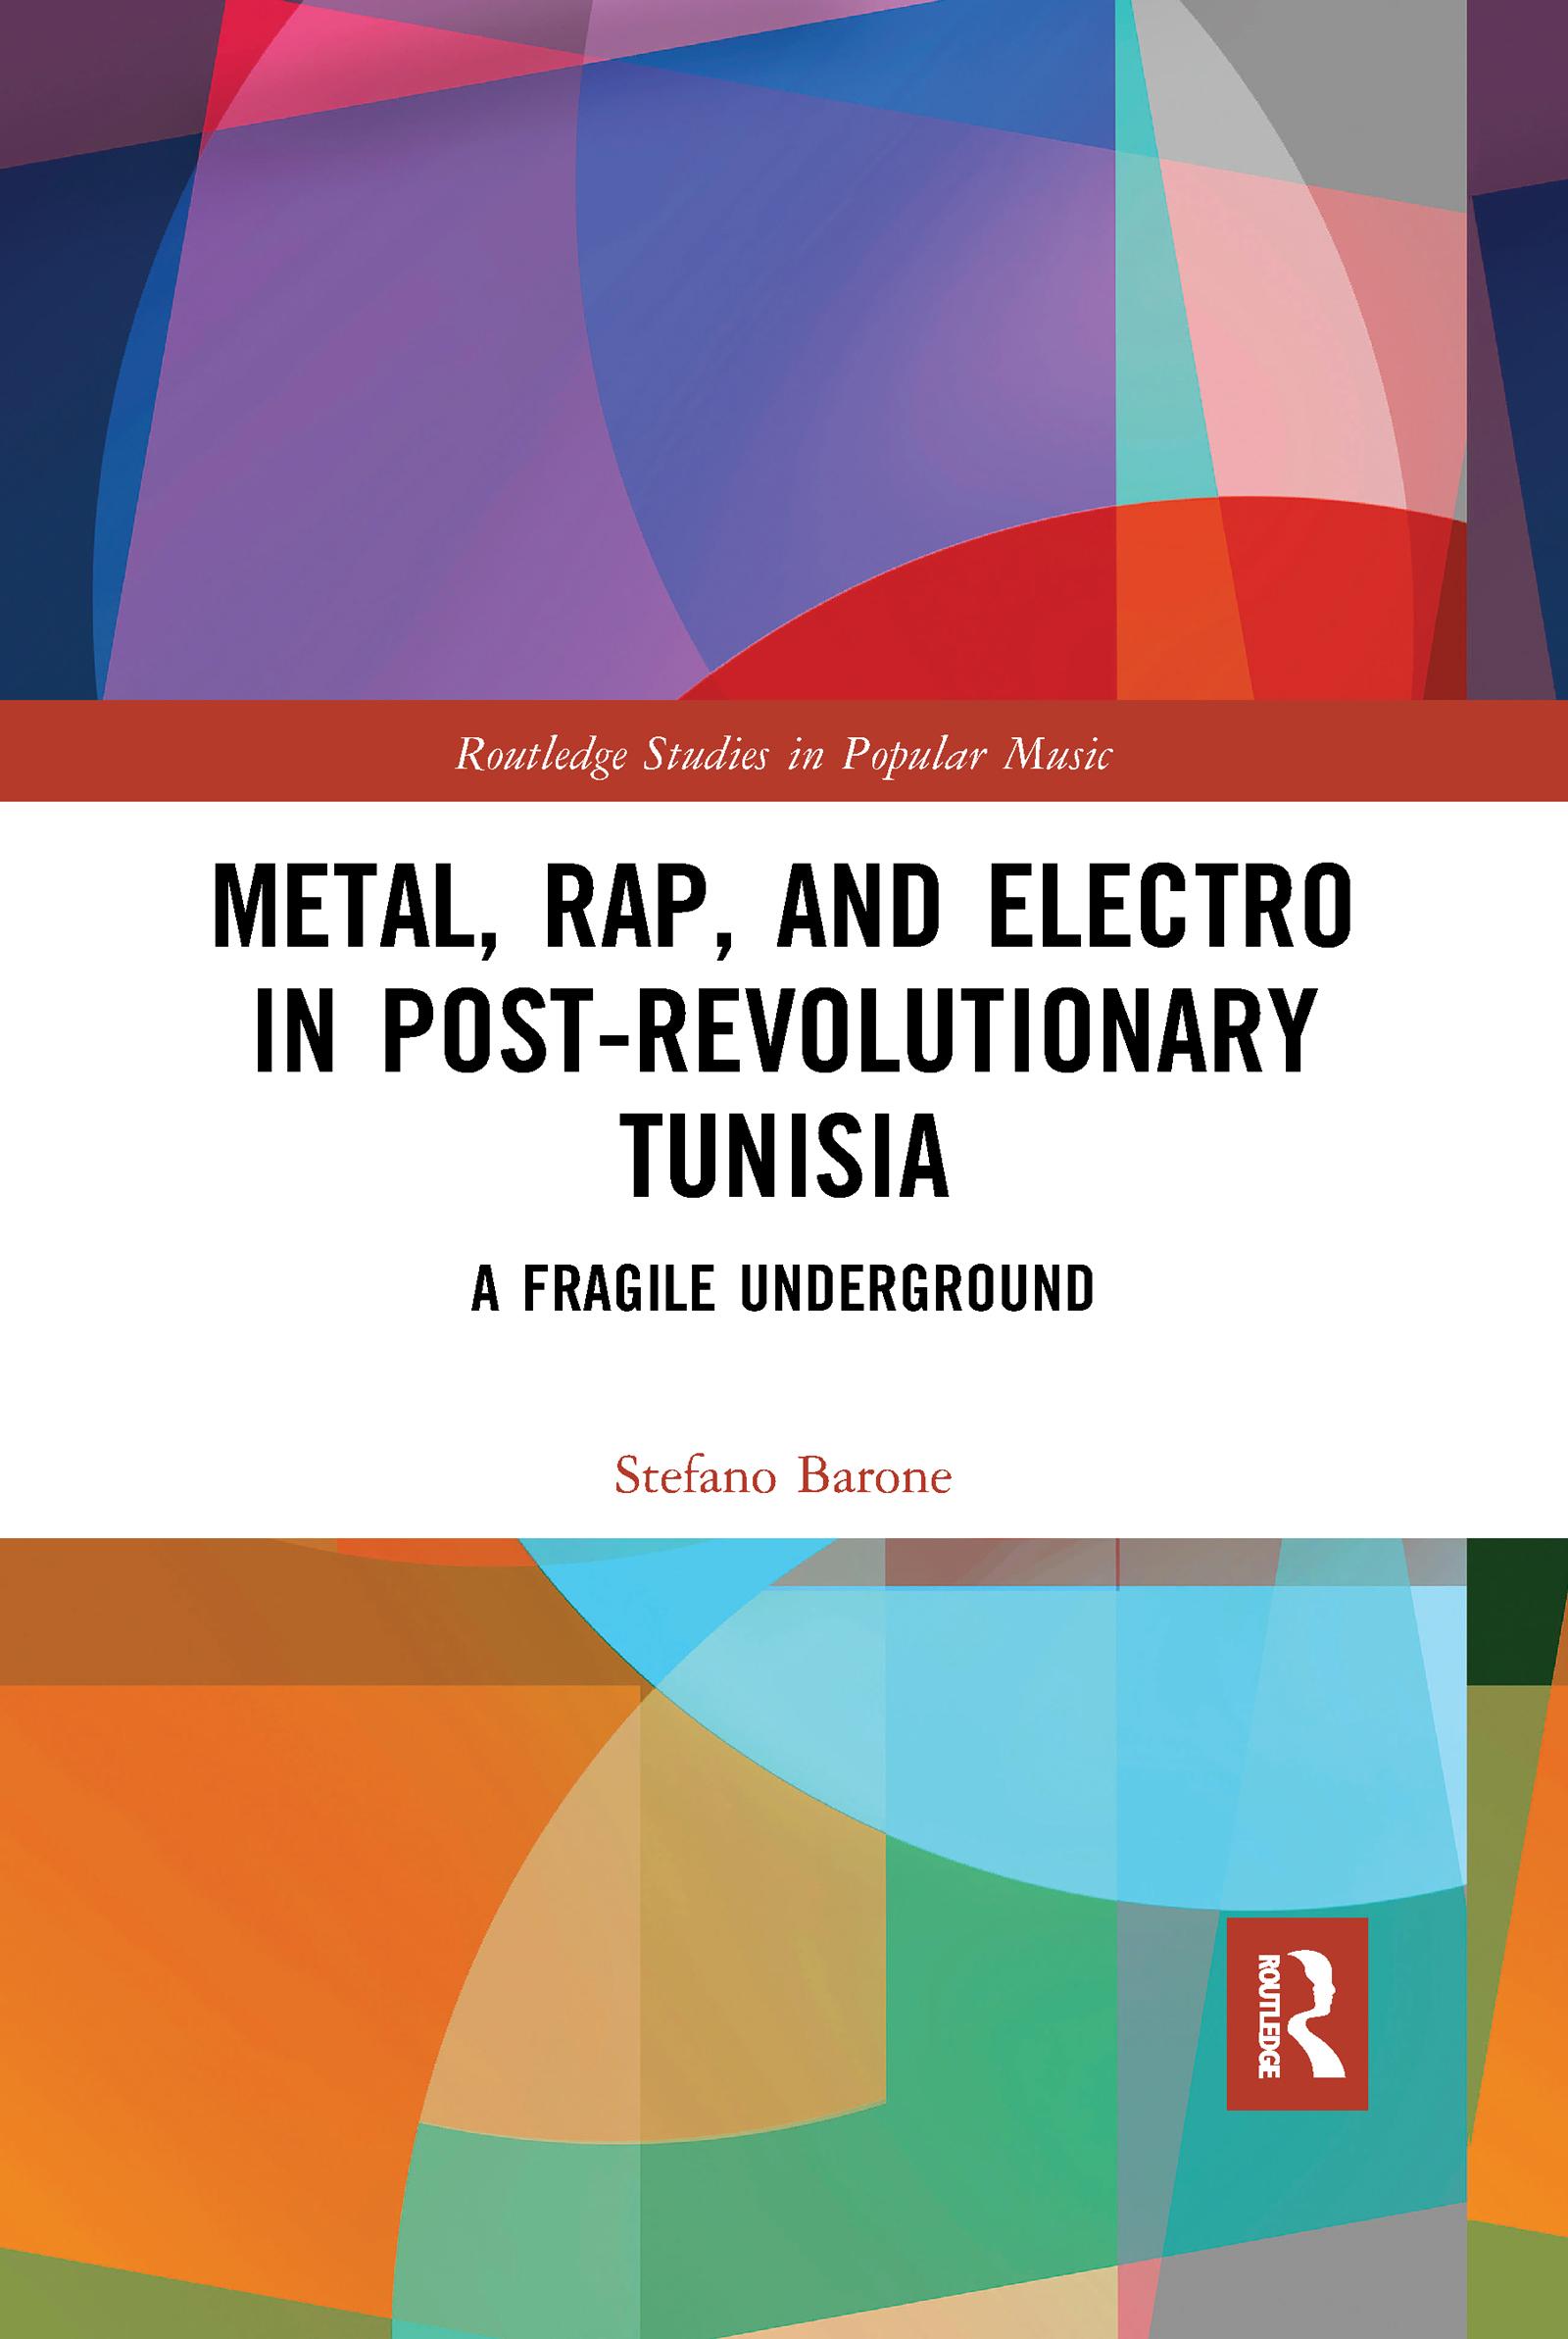 Metal, Rap, and Electro in Post-Revolutionary Tunisia